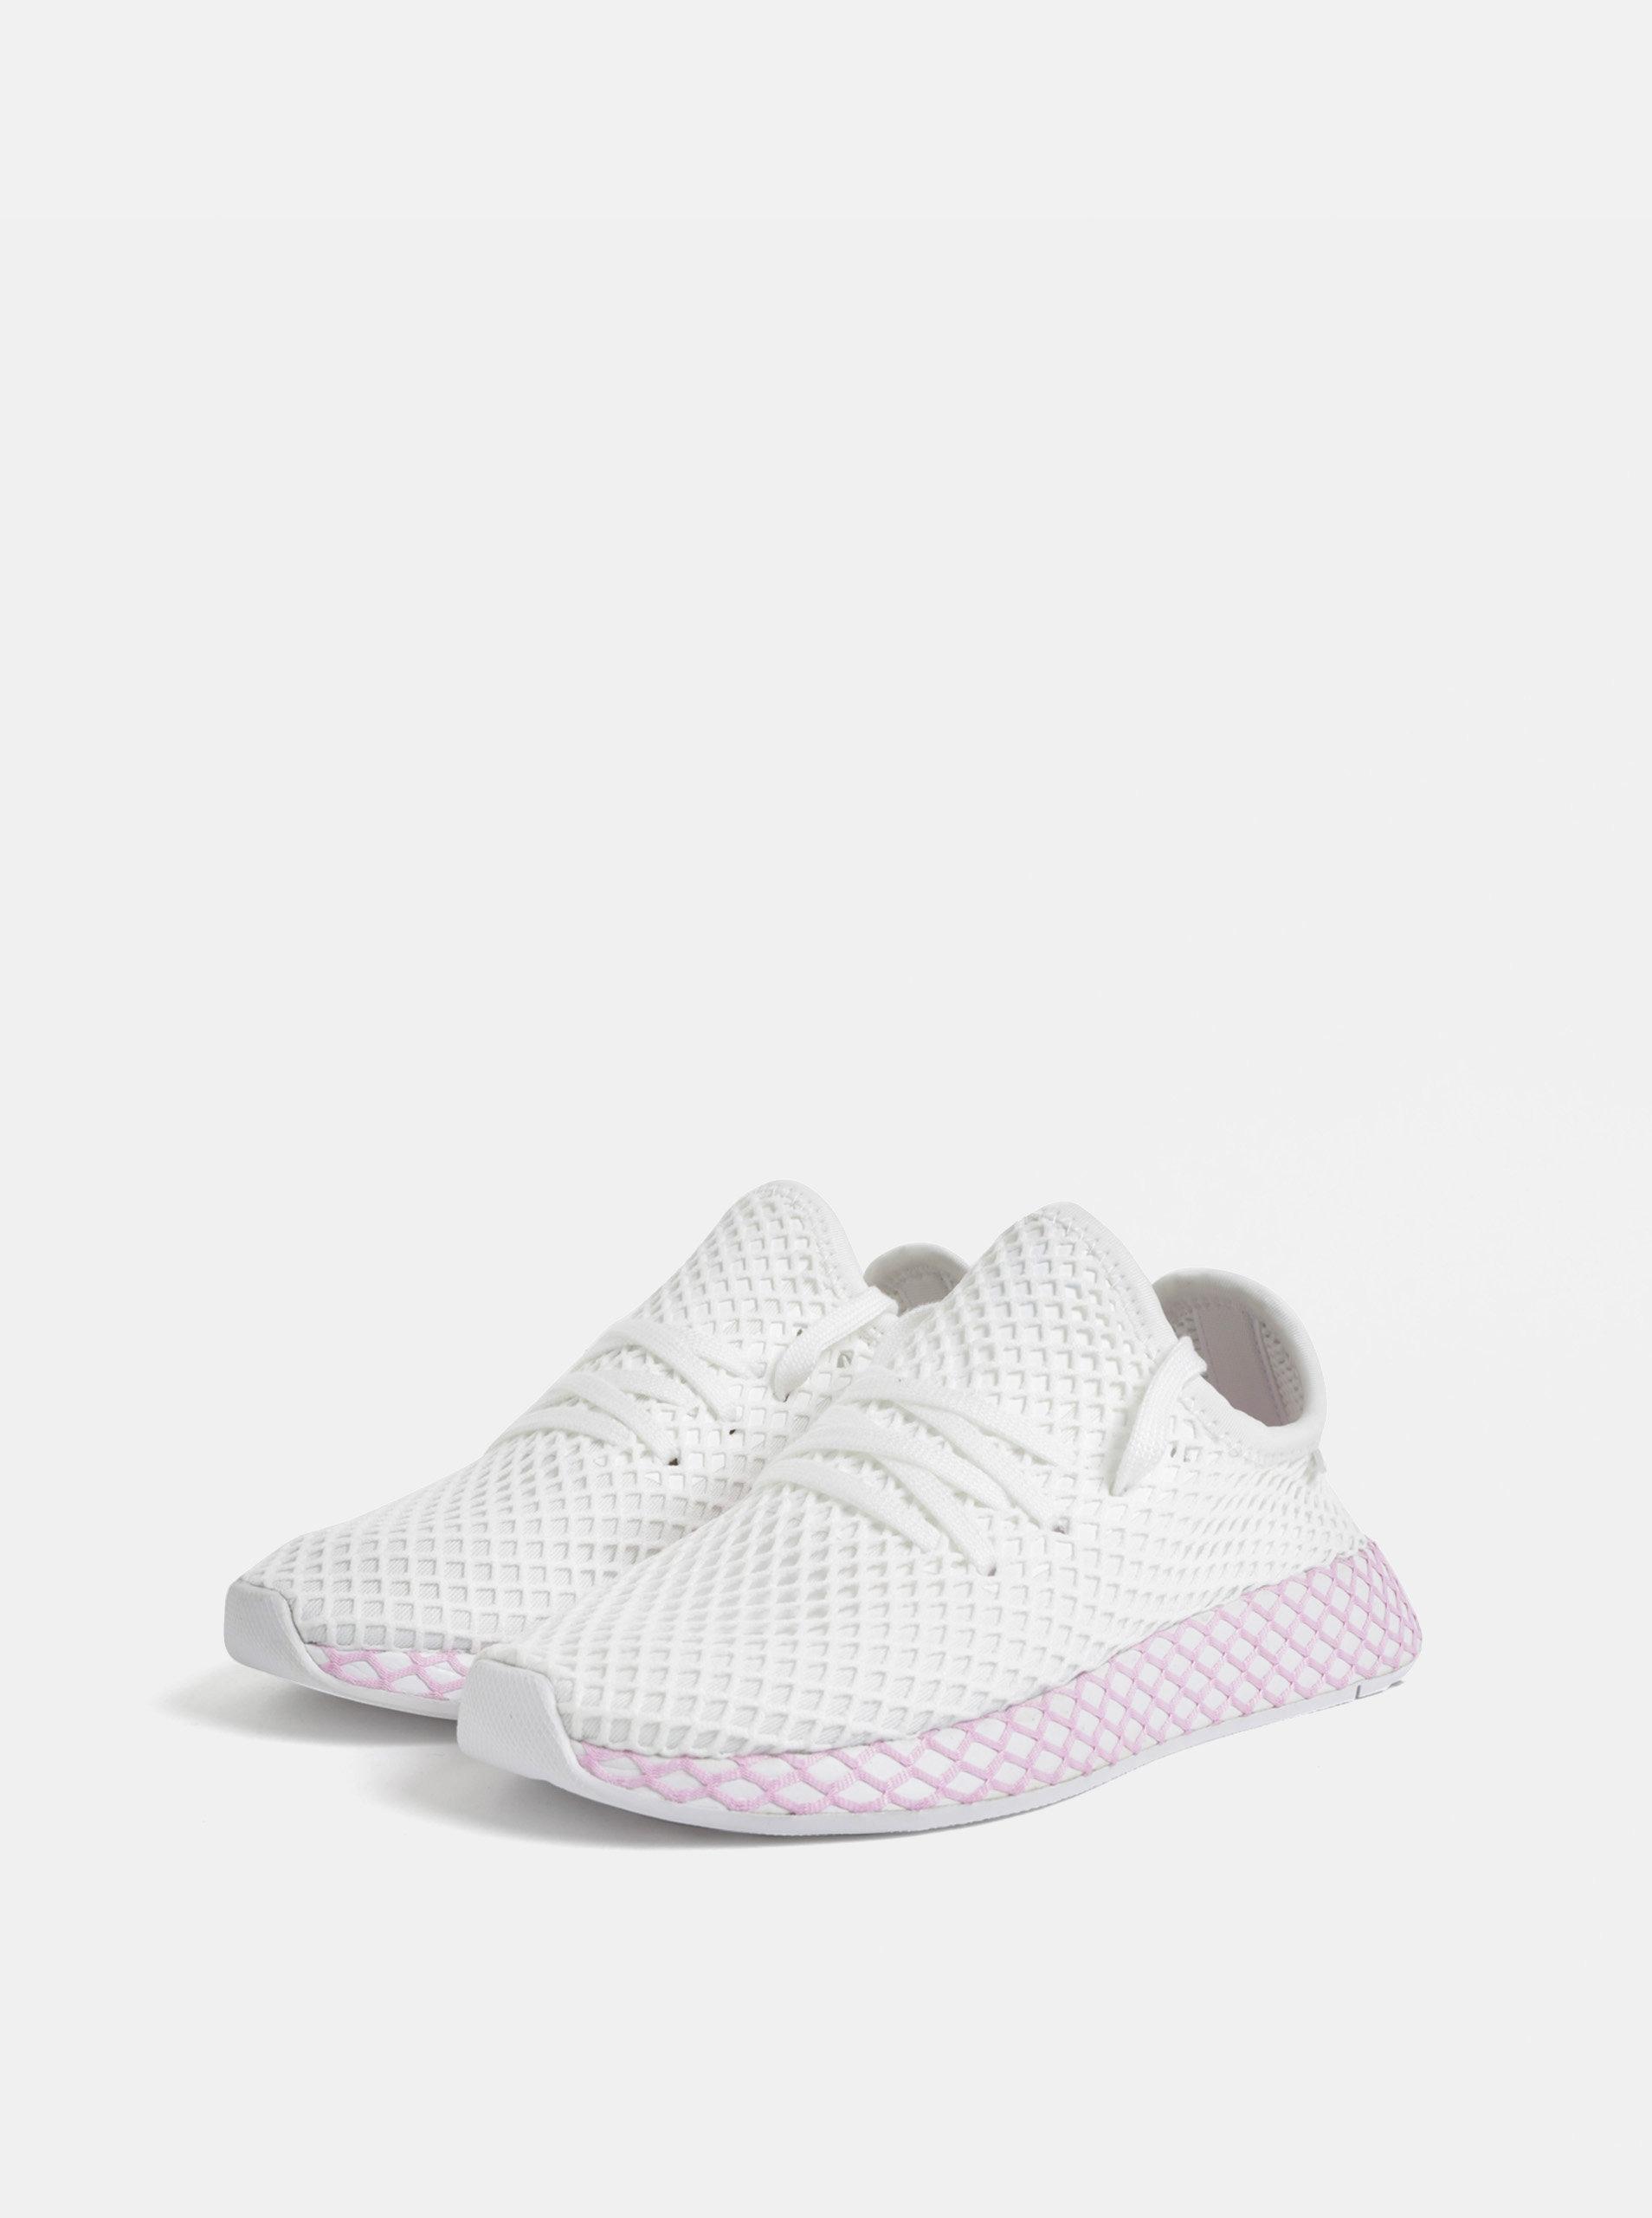 Deerupt Bílé Dámské Sleva Síťované Adidas Originals Růžovo ...